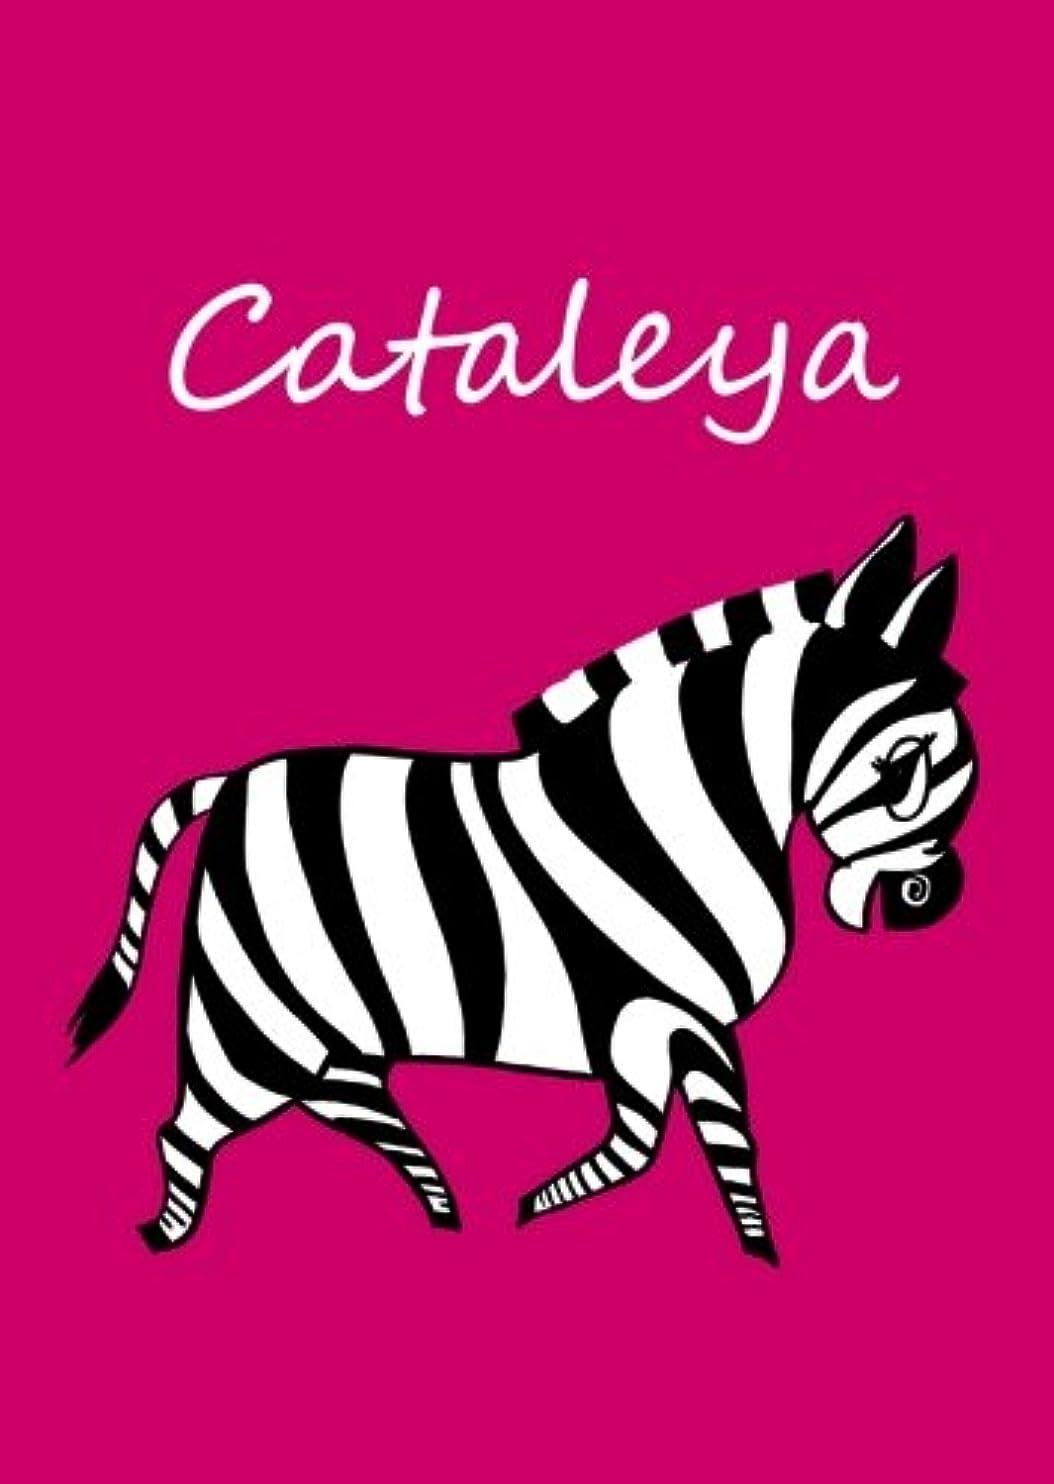 資源チェス検索エンジン最適化Cataleya: personalisiertes Malbuch / Notizbuch / Tagebuch - Zebra - A4 - blanko